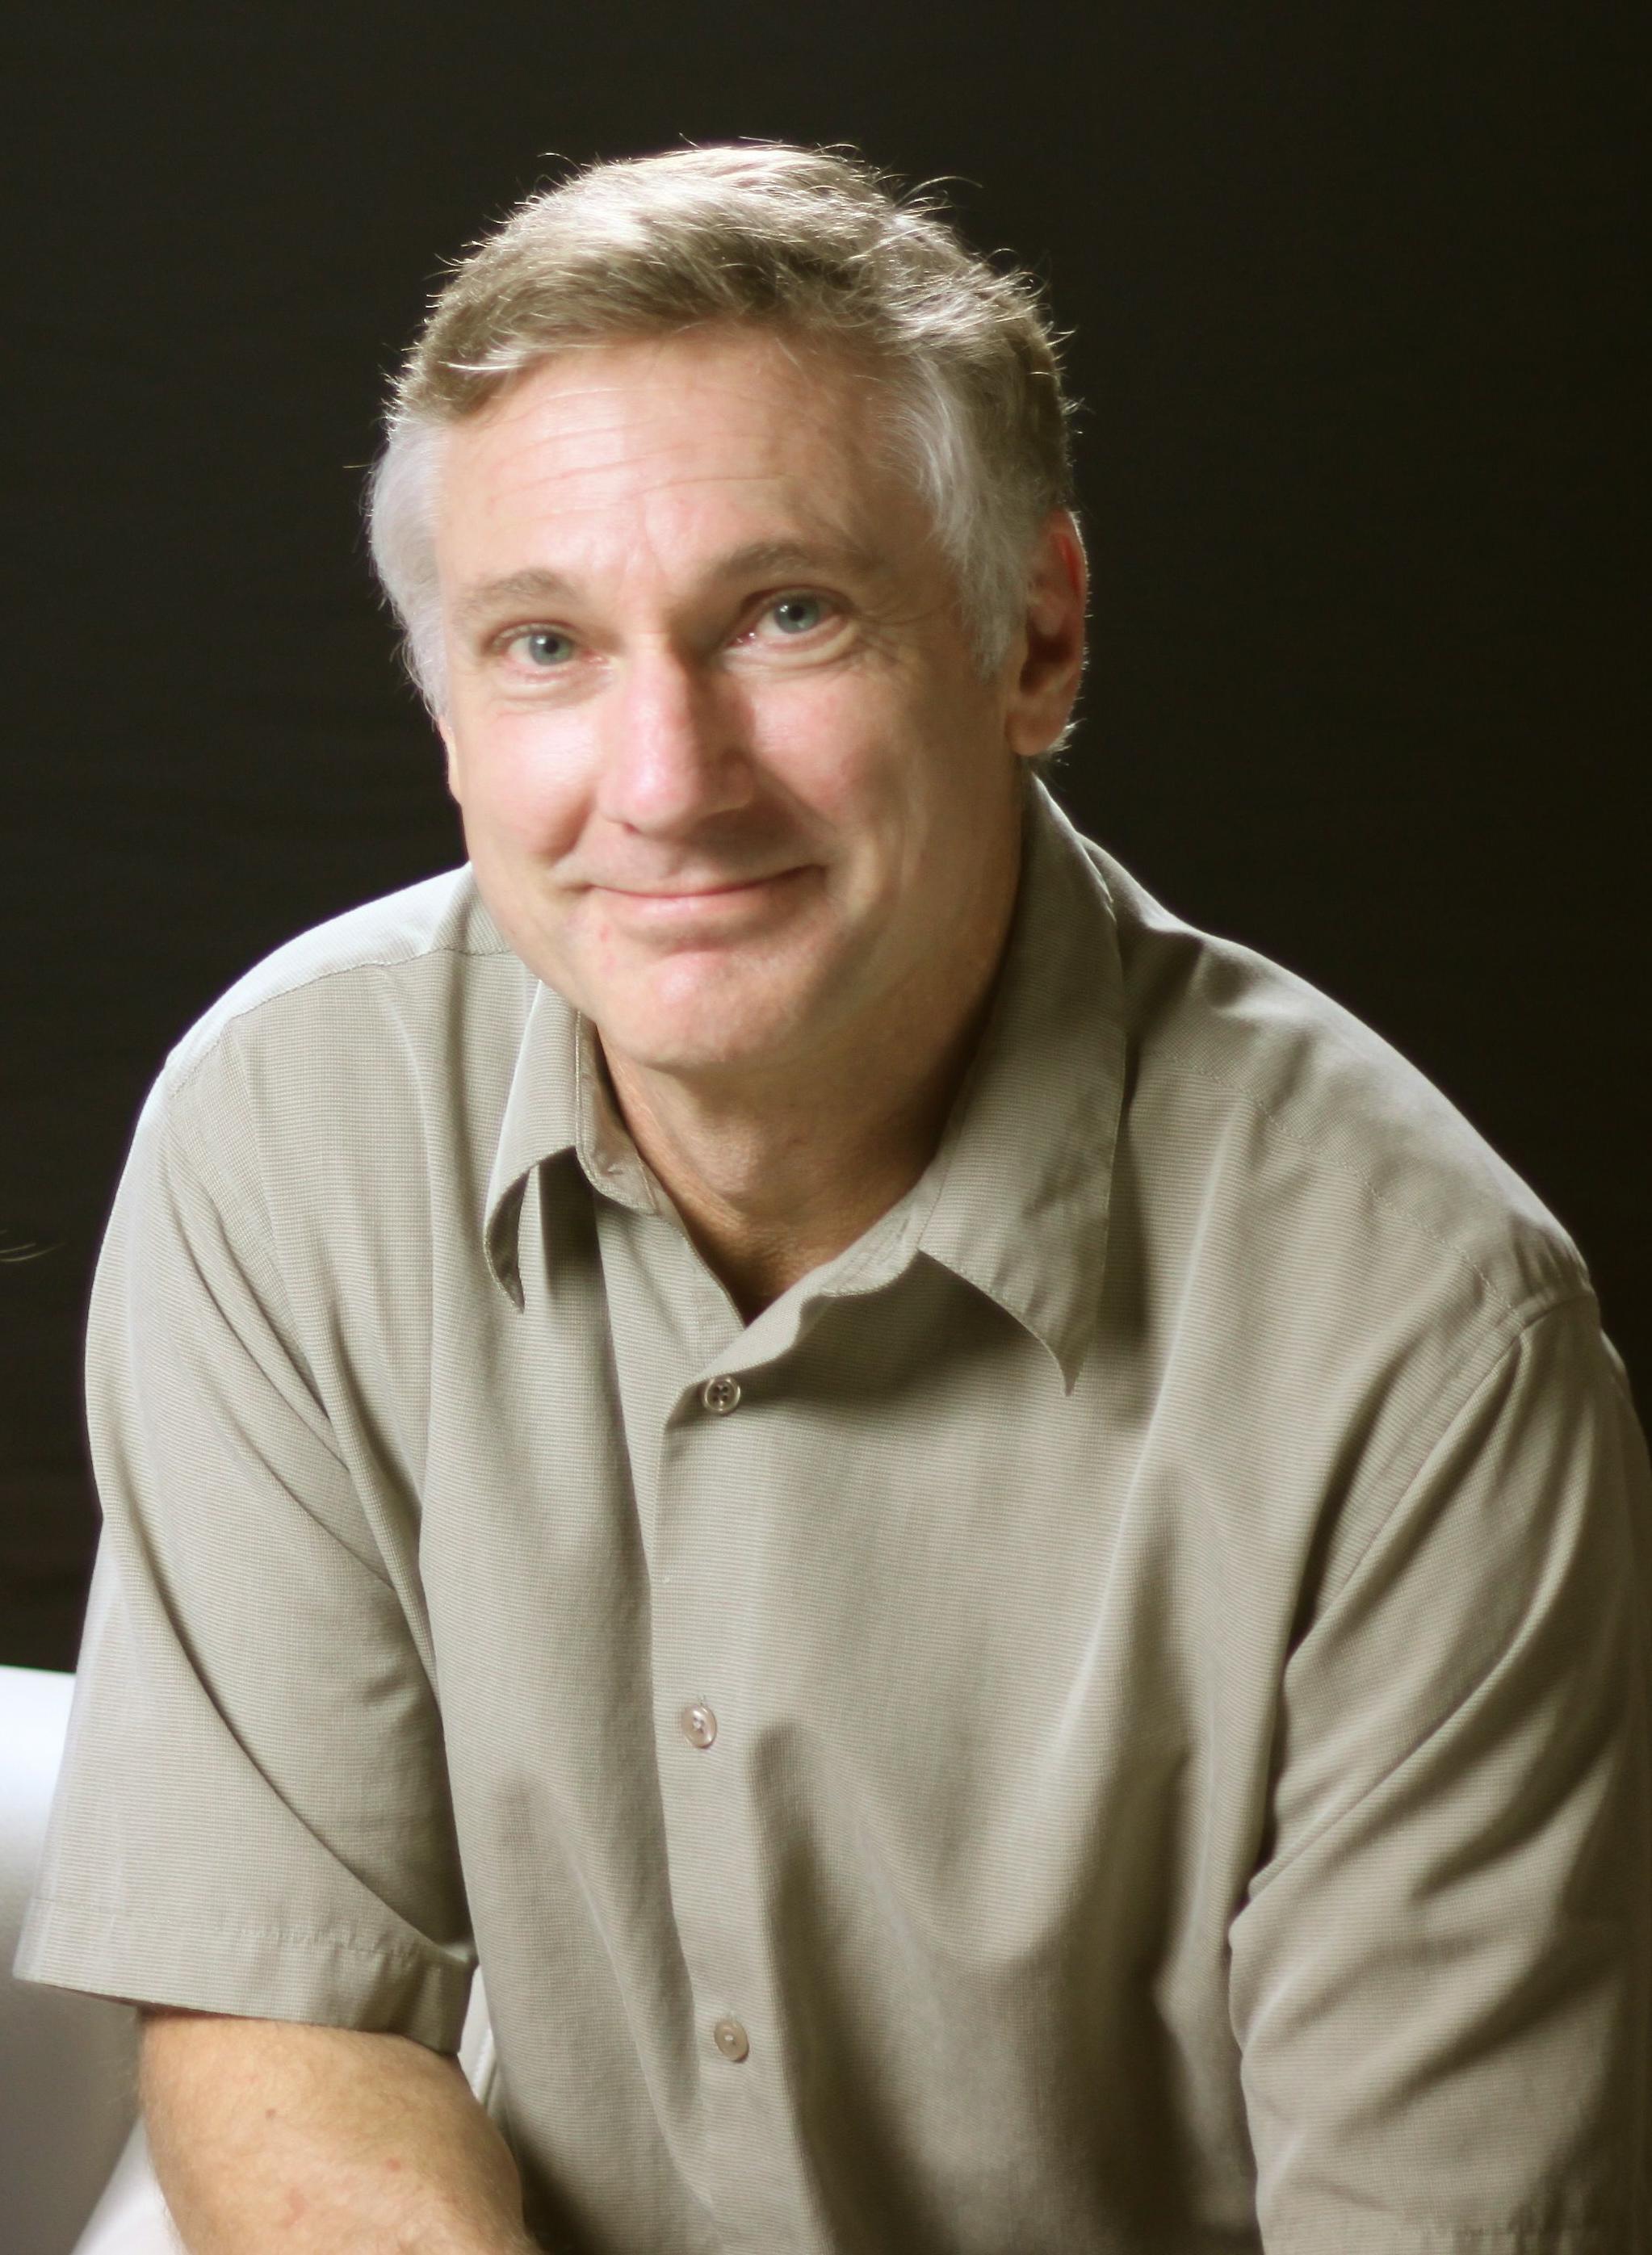 Todd Sorenson, president at High Tech Ministries